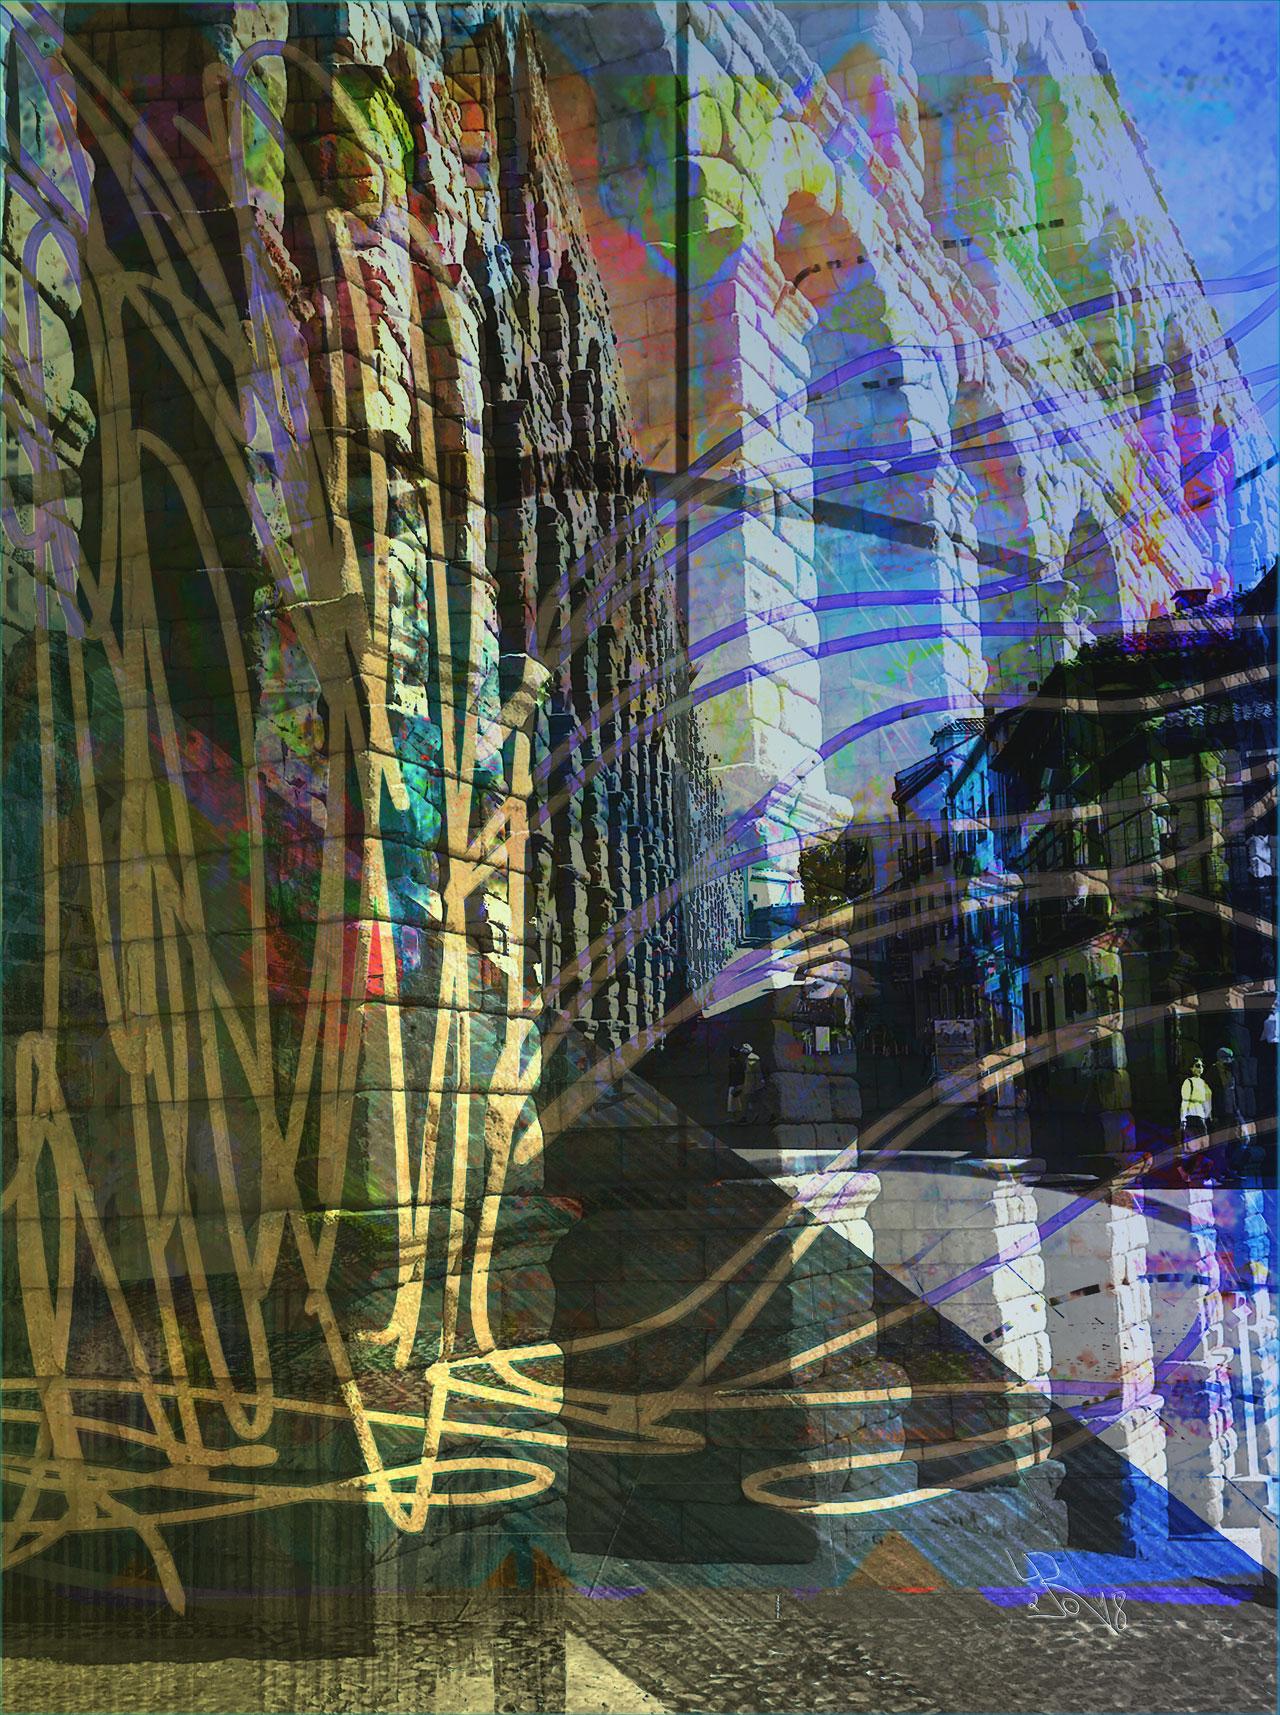 Modo supervivencia  Digital C-Print, 67 x 50 cm